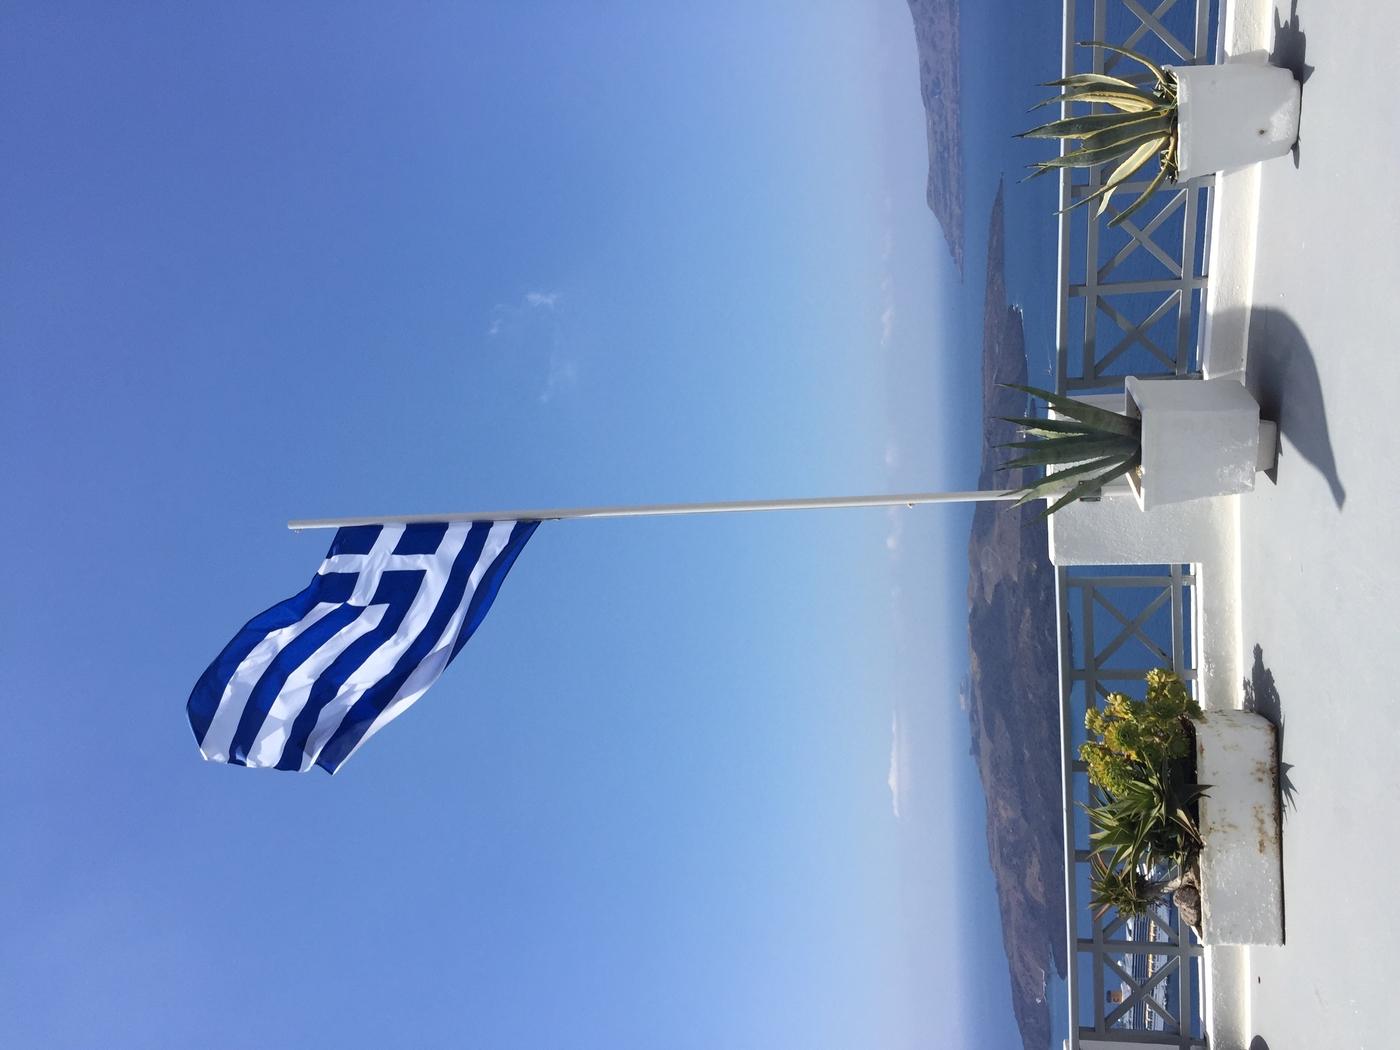 Santorini, part 1